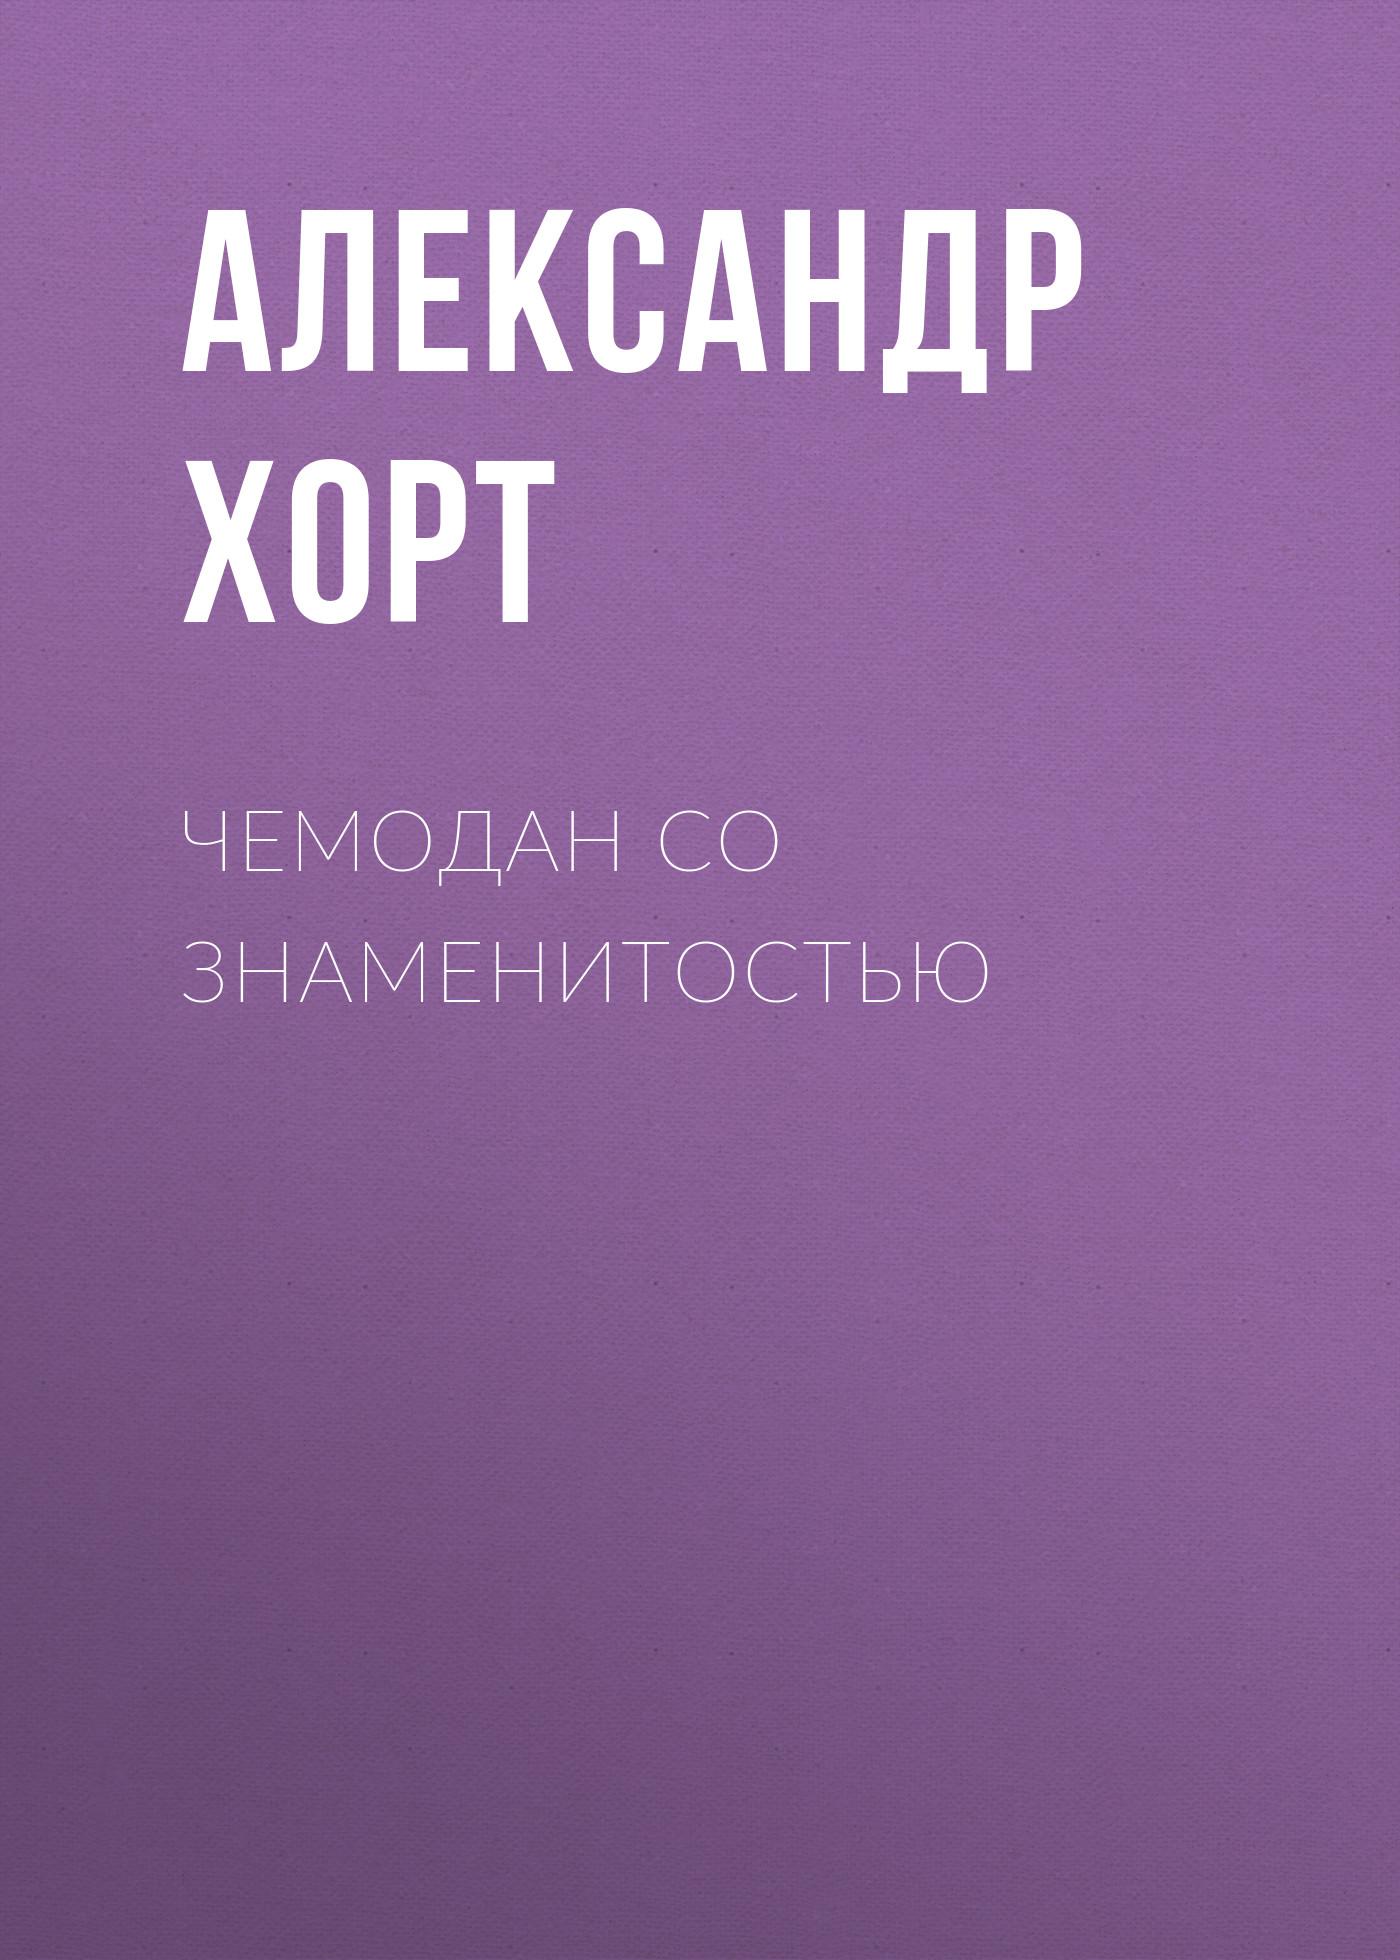 Александр Хорт Чемодан со знаменитостью александр хорт операция бронежилеты